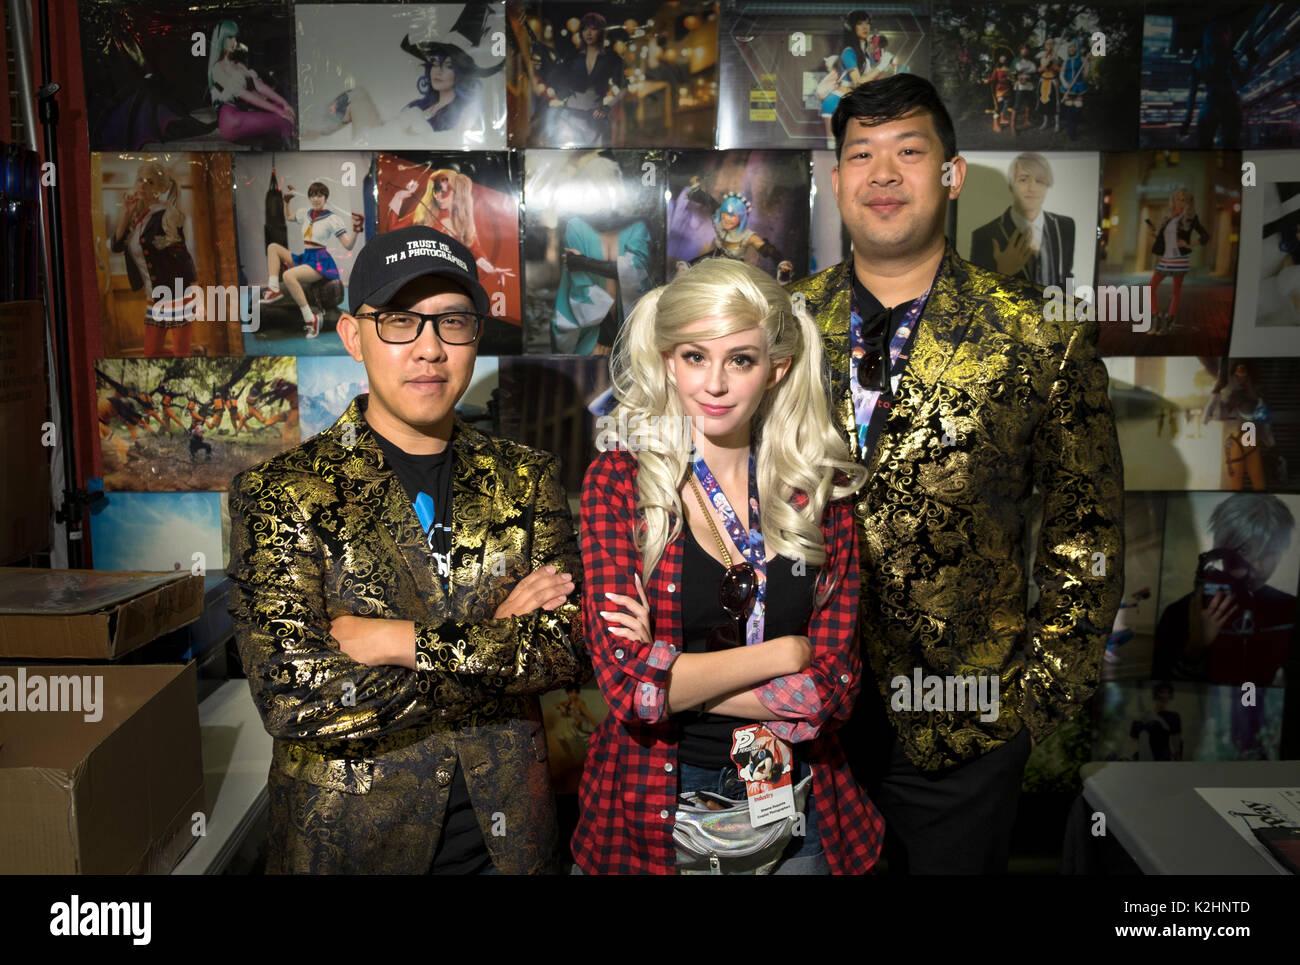 cosplay photographers - Stock Image